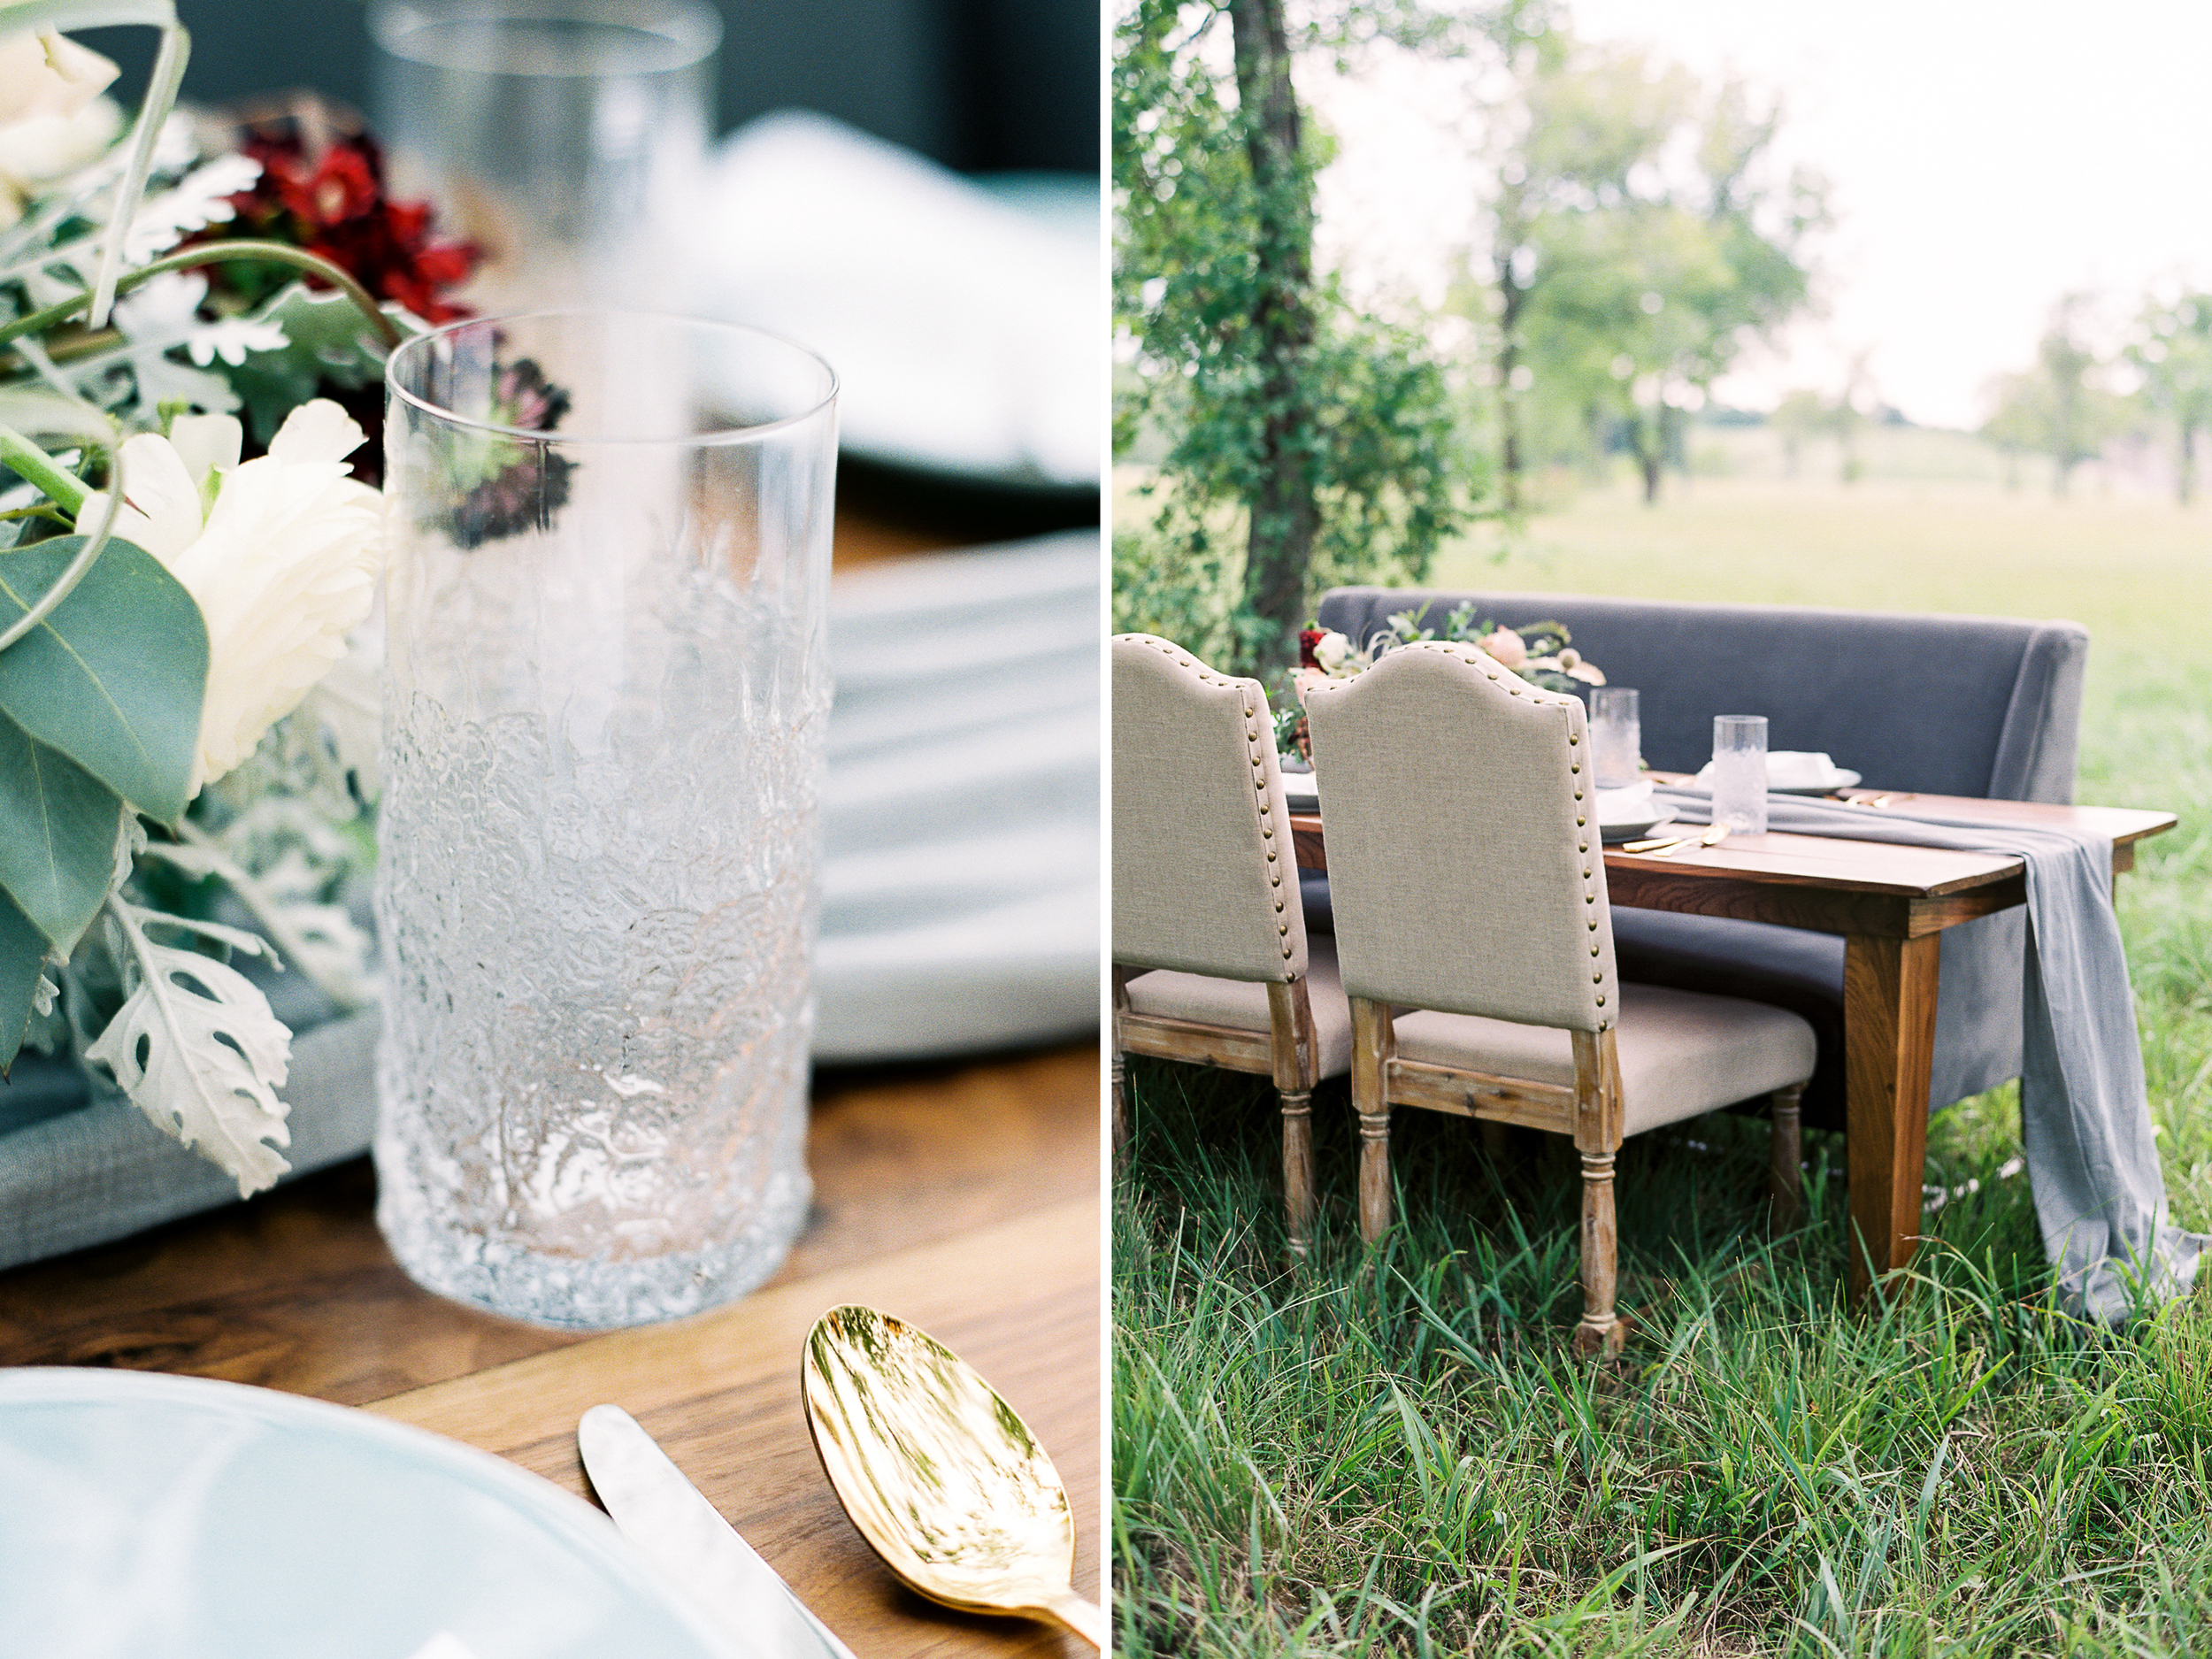 Dana-Fernandez-Photography-Houston-Wedding-Photographer-Film-100-Layer-Cake-Wedding-Inspiration-Destination-101.jpg